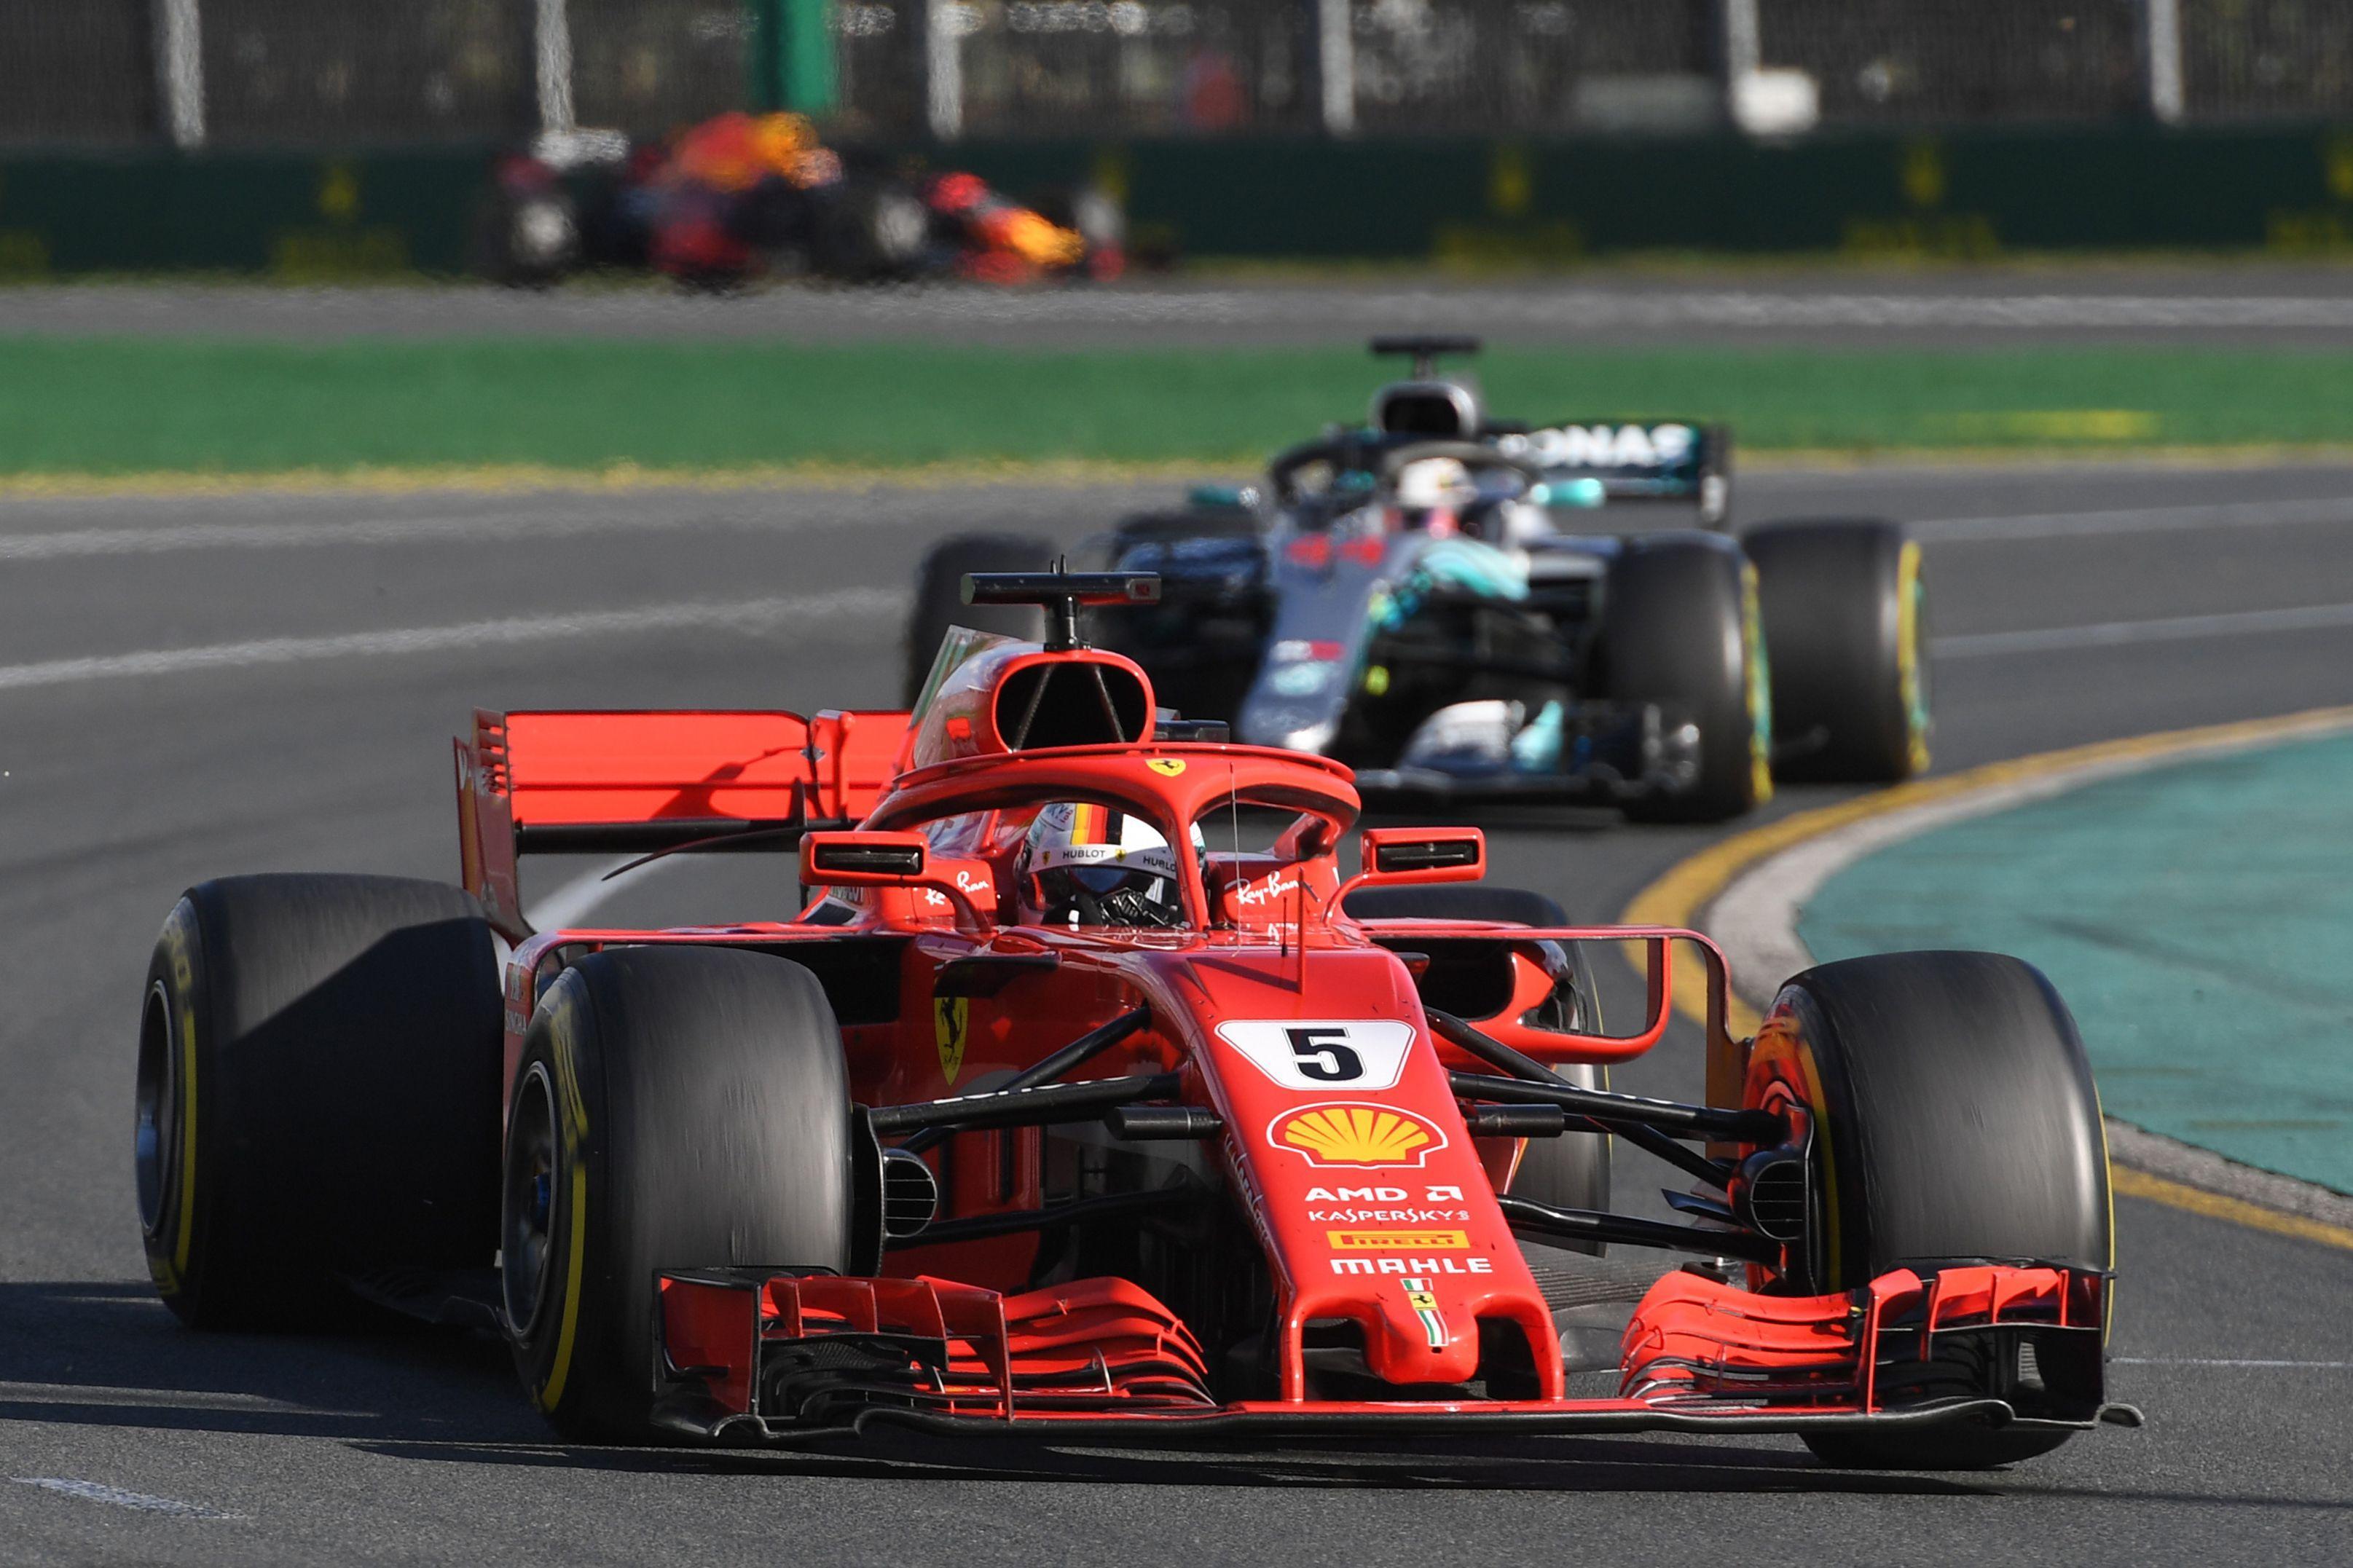 Sebastian Vettel finishes ahead of Lewis Hamilton in Australian Gran Prix